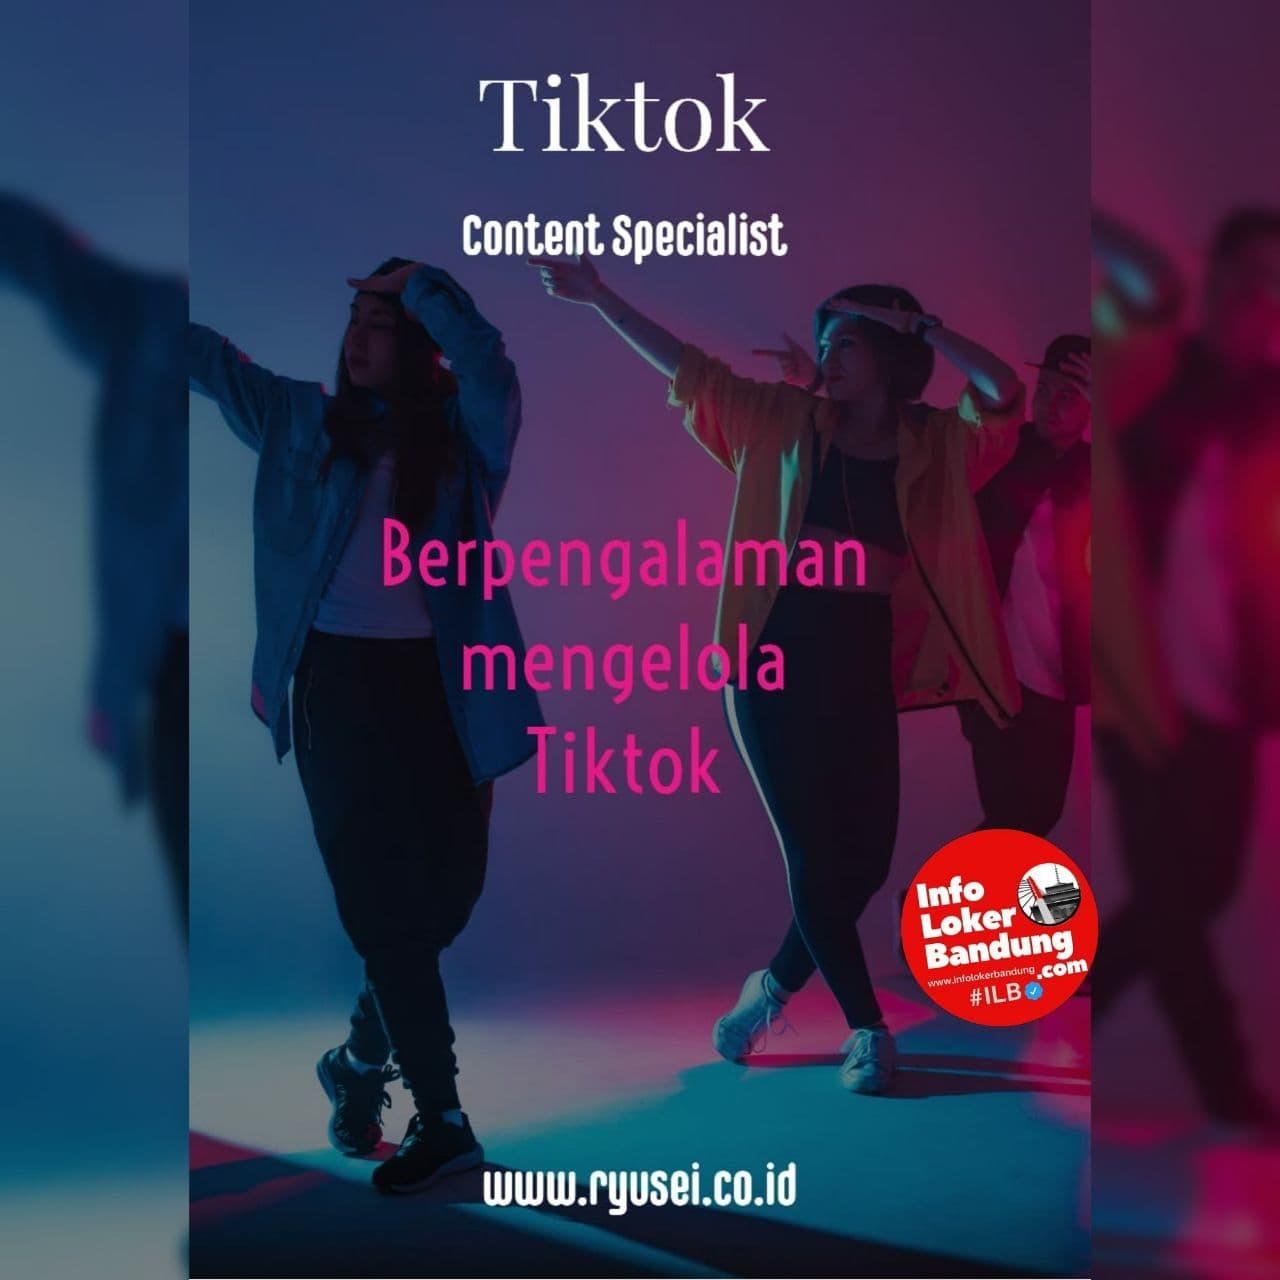 Lowongan Kerja Content Creator Tiktok Ryusei Indonesia Bandung Desember 2020